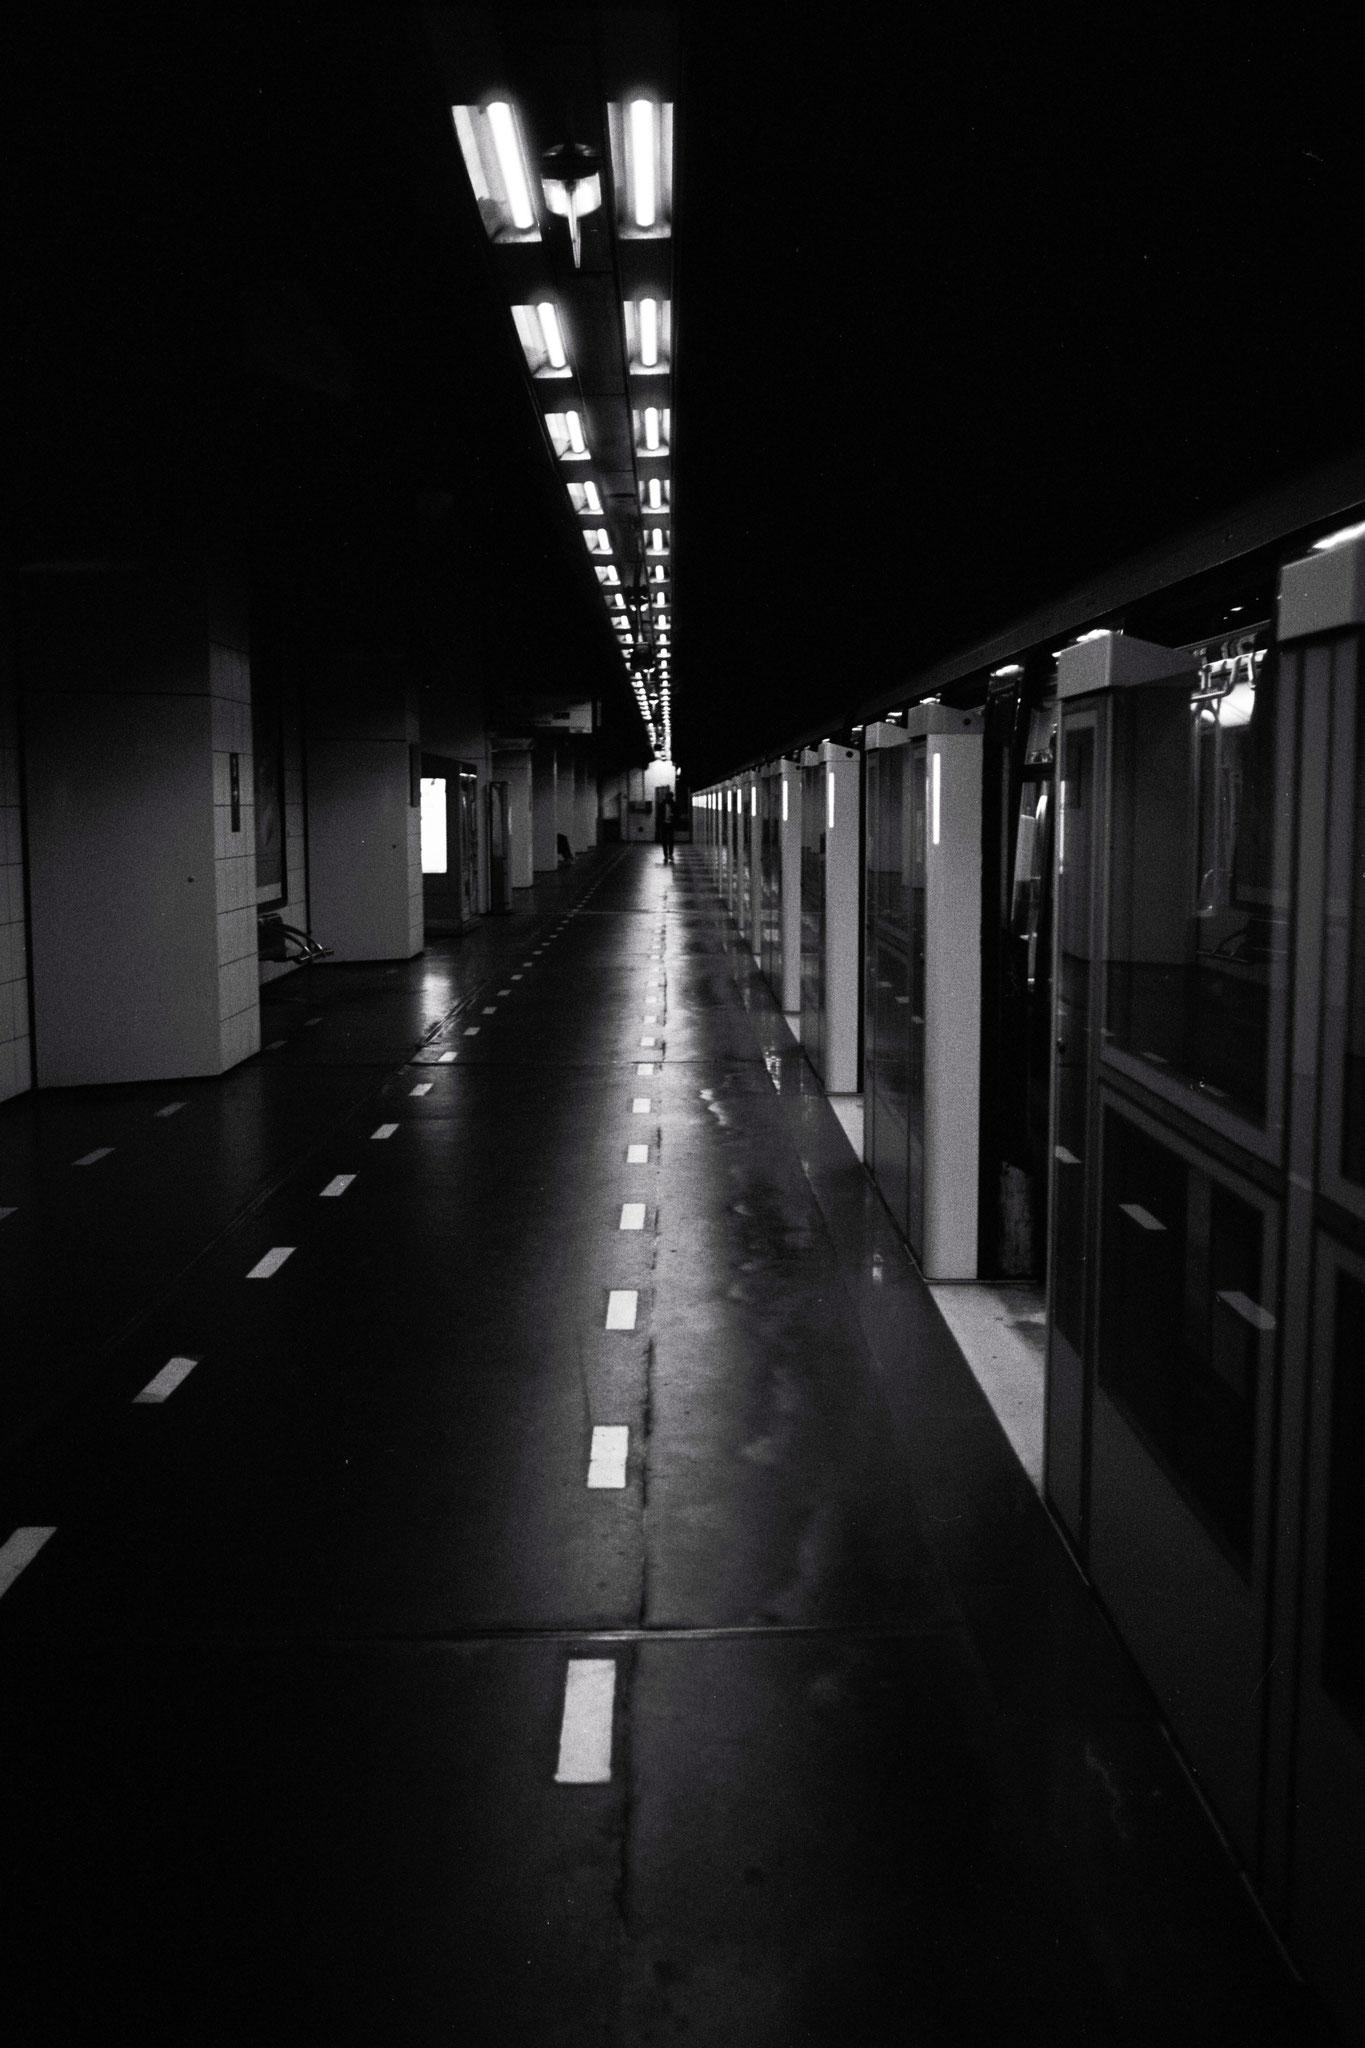 """On the road to Paris"" - Station ""La Défense"" (M°1), Puteaux (2021). Rollei Blackbird Creative 64 ASA  + Rolleiflex SL35. ©Clémence Rougetet"